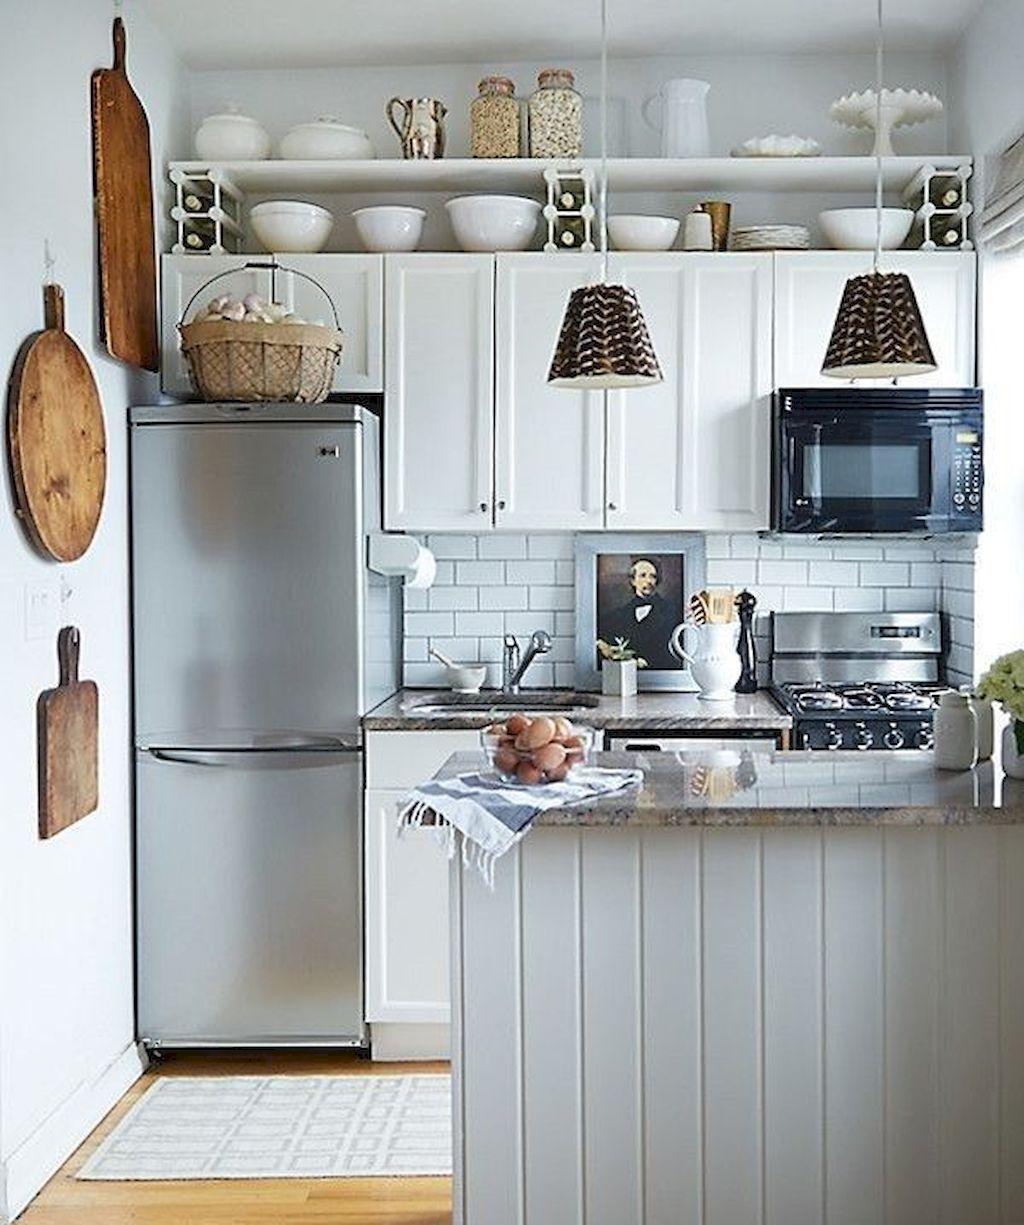 16 amazing tiny house kitchen design ideas in 2019 kitchen y rh pinterest com